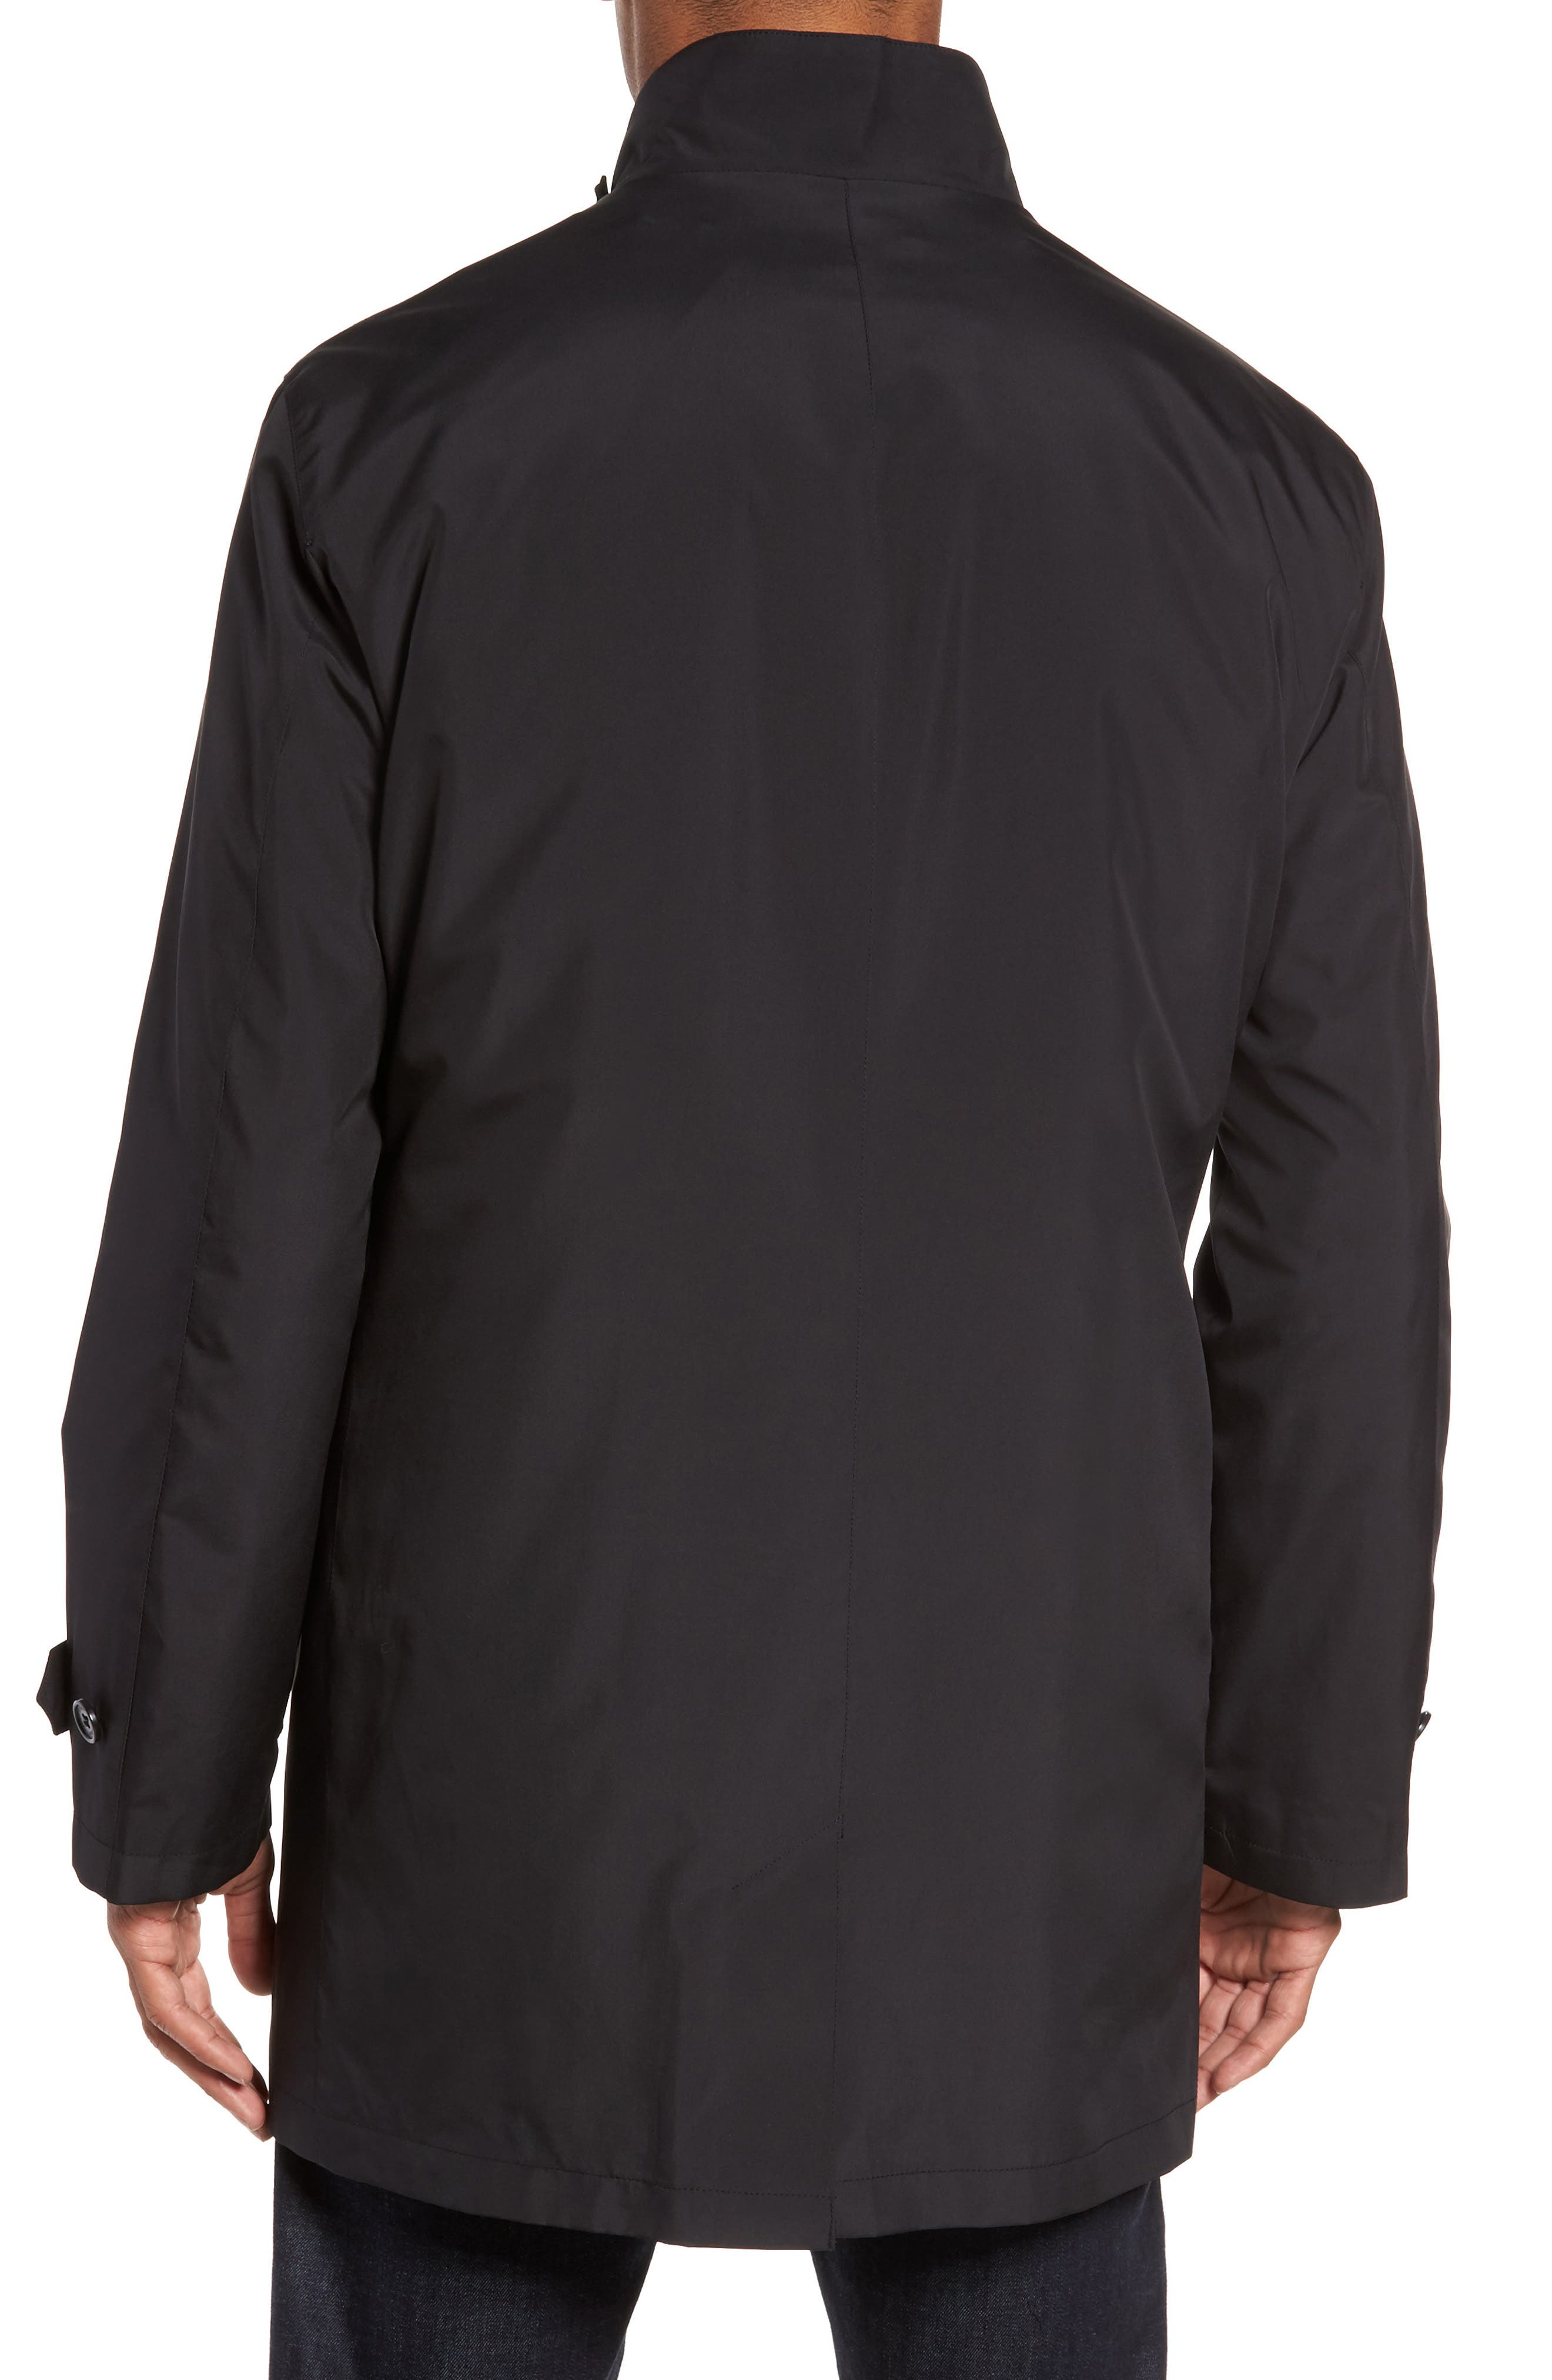 'Hamlet' Raincoat,                             Alternate thumbnail 2, color,                             001